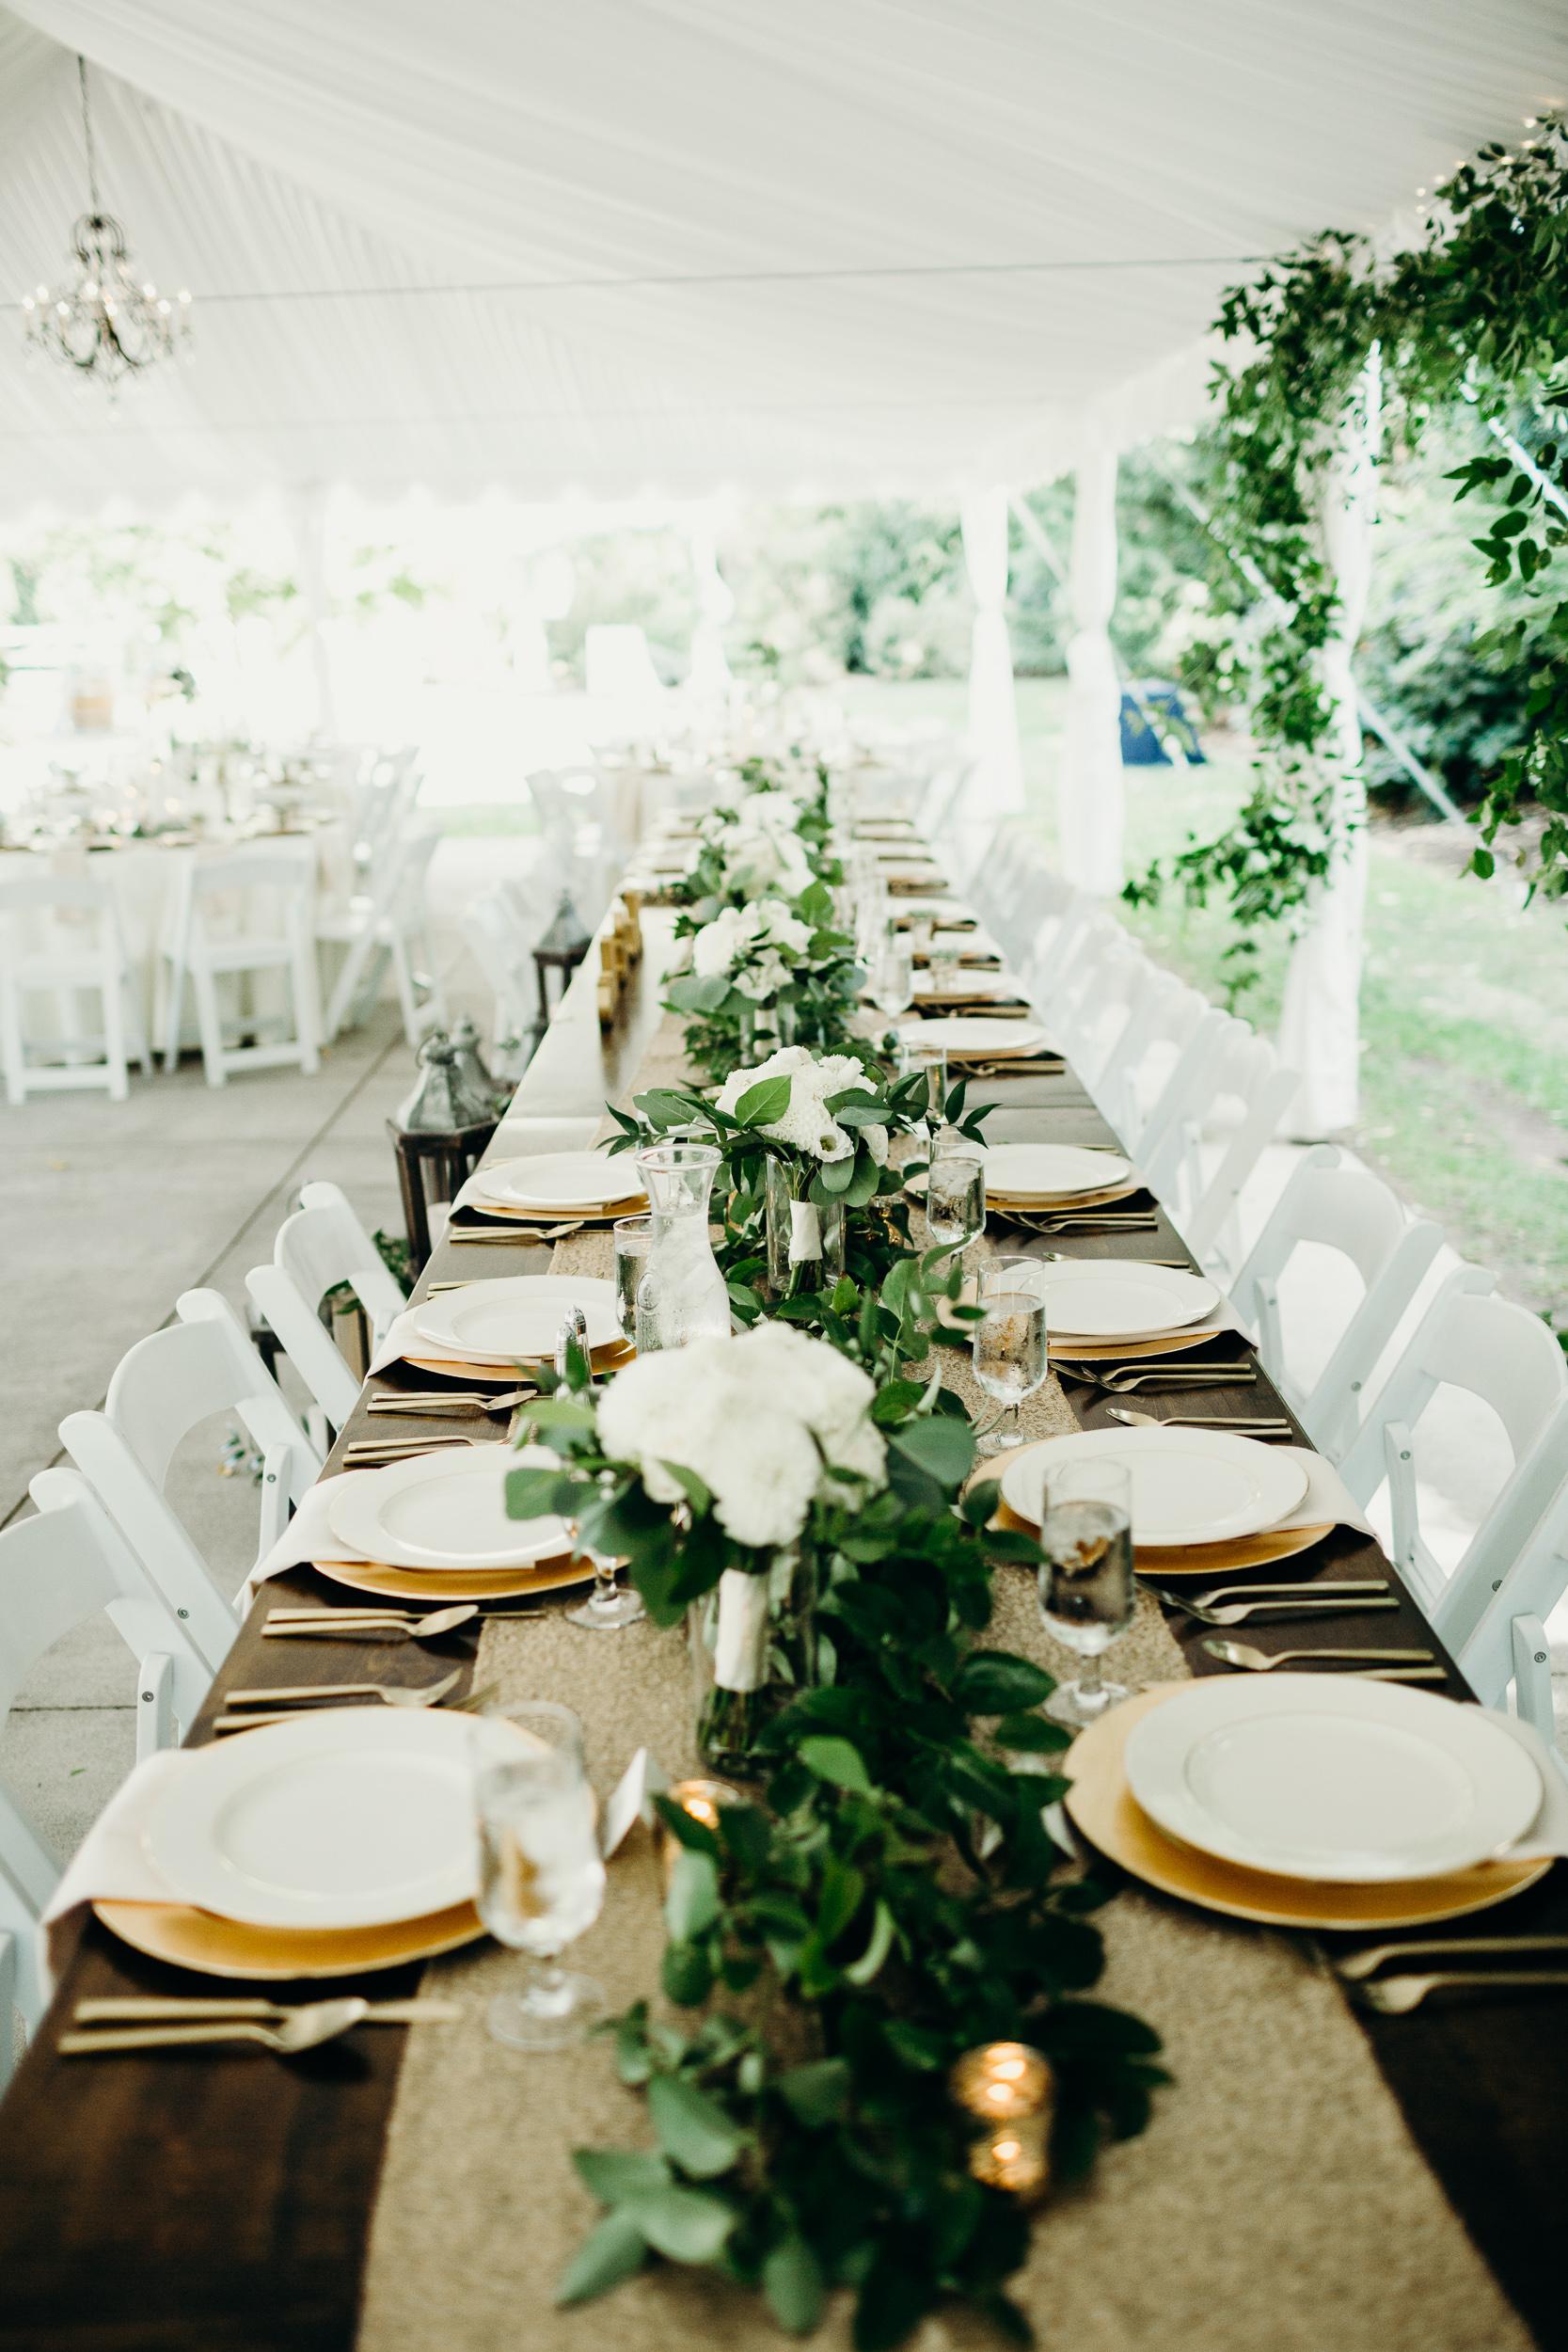 20170820 Savanna & Vince Wedding 1462.jpg